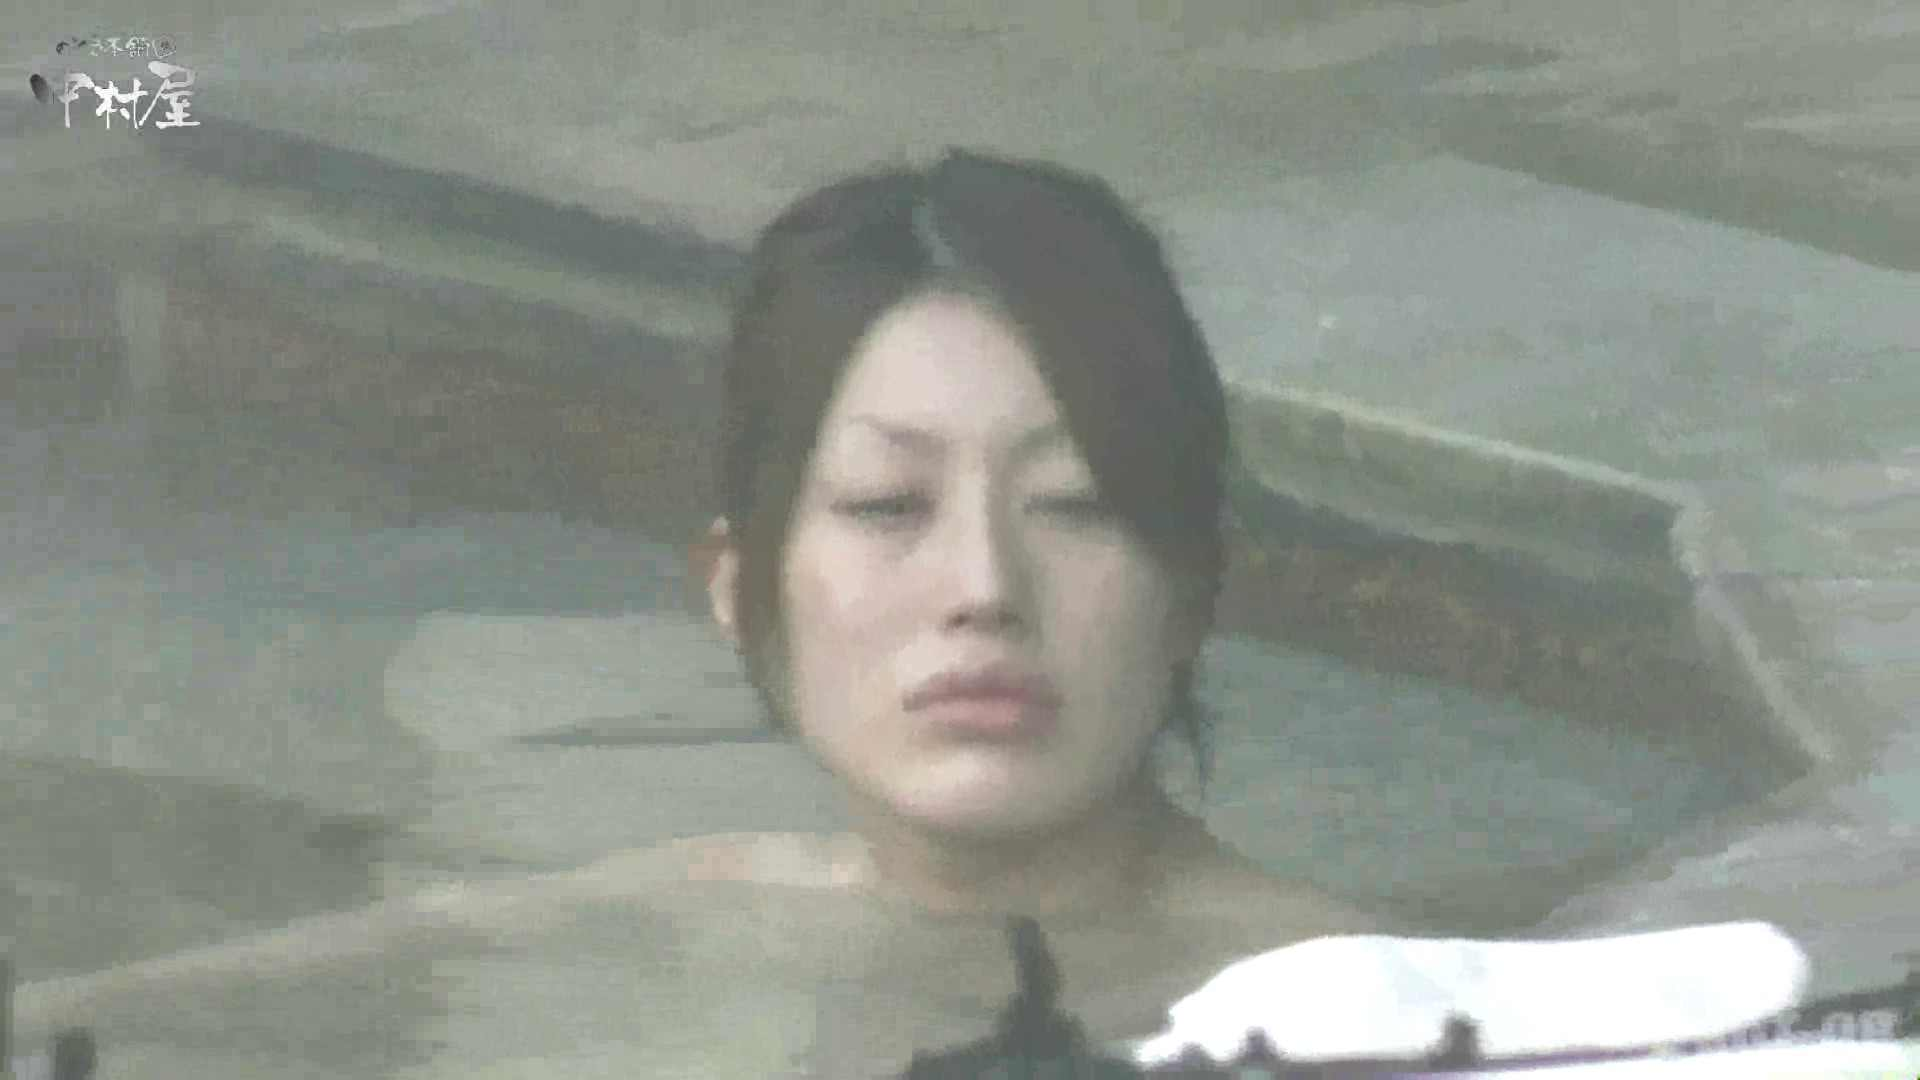 Aquaな露天風呂Vol.872潜入盗撮露天風呂八判湯 其の三 盗撮特集 | 潜入画像  96画像 64